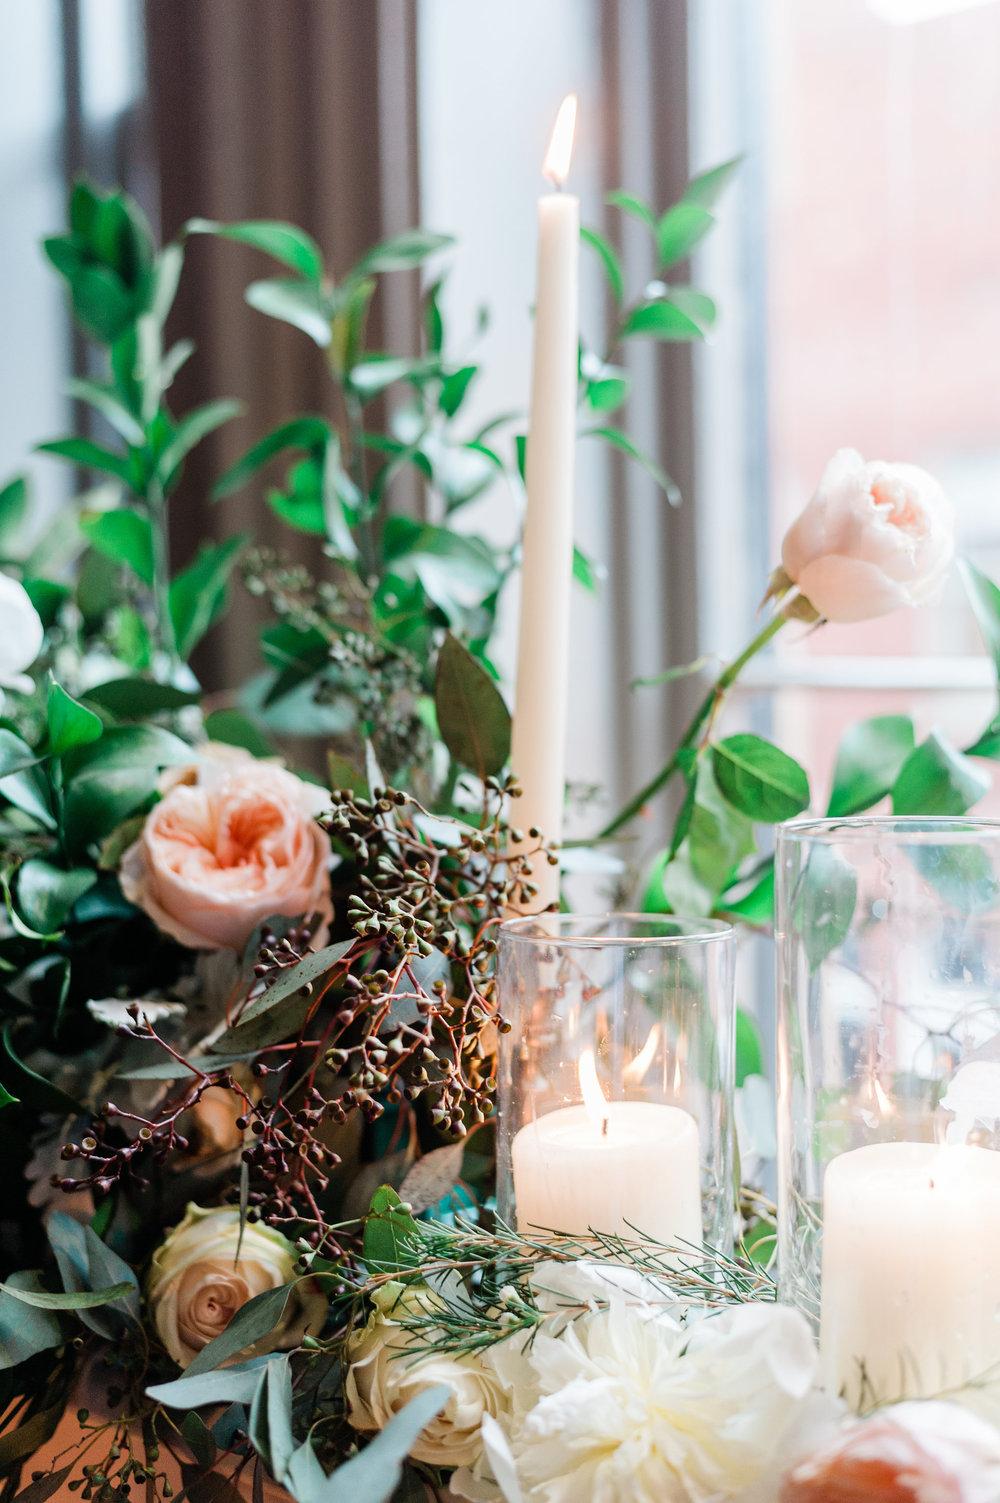 ivory-and-beau-bridal-boutique-i-and-b-florals-kim-and-luke-apt-b-photography-garibaldis-cafe-savannah-savannah-vintage-rentals-16.JPG